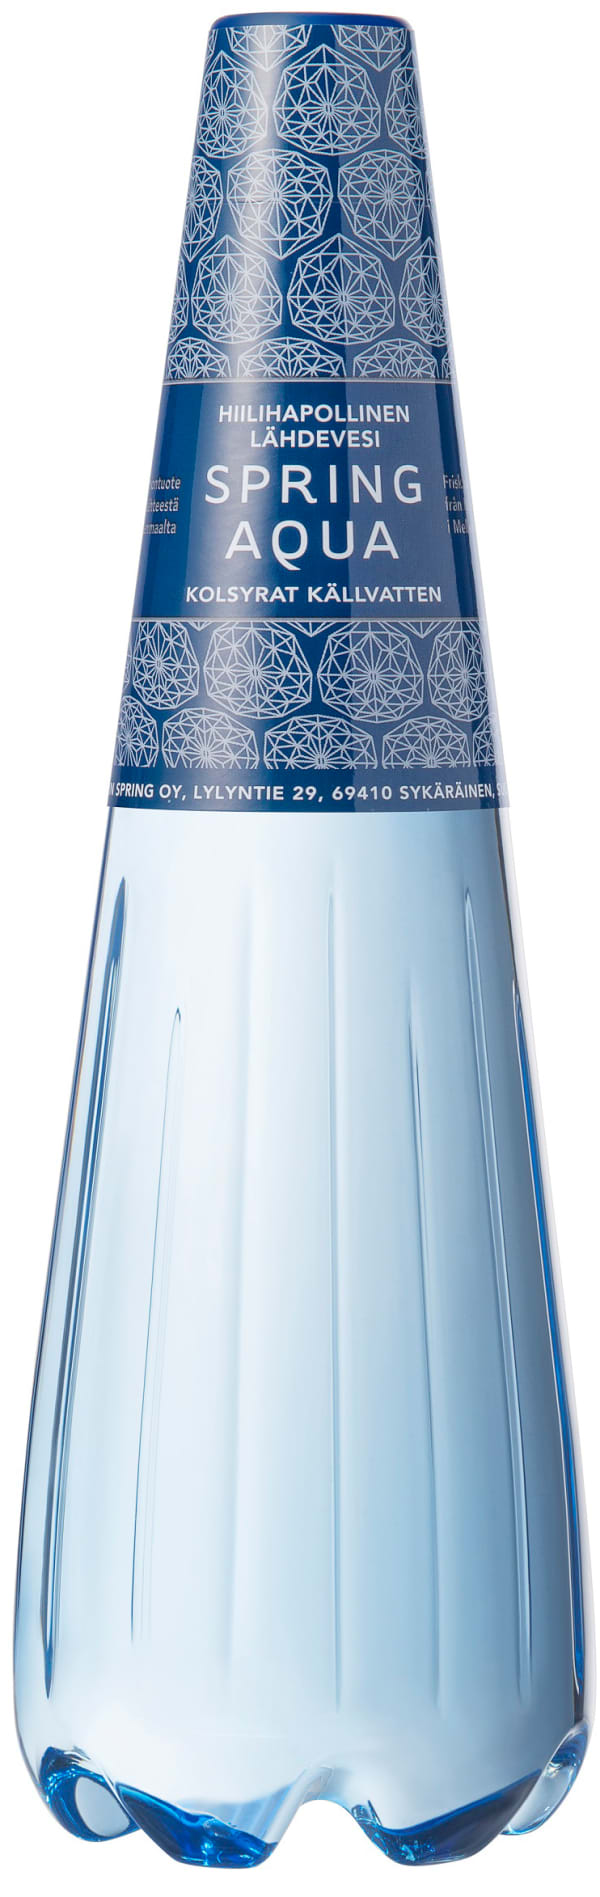 Spring Aqua Hiilihapollinen Lähdevesi plastic bottle